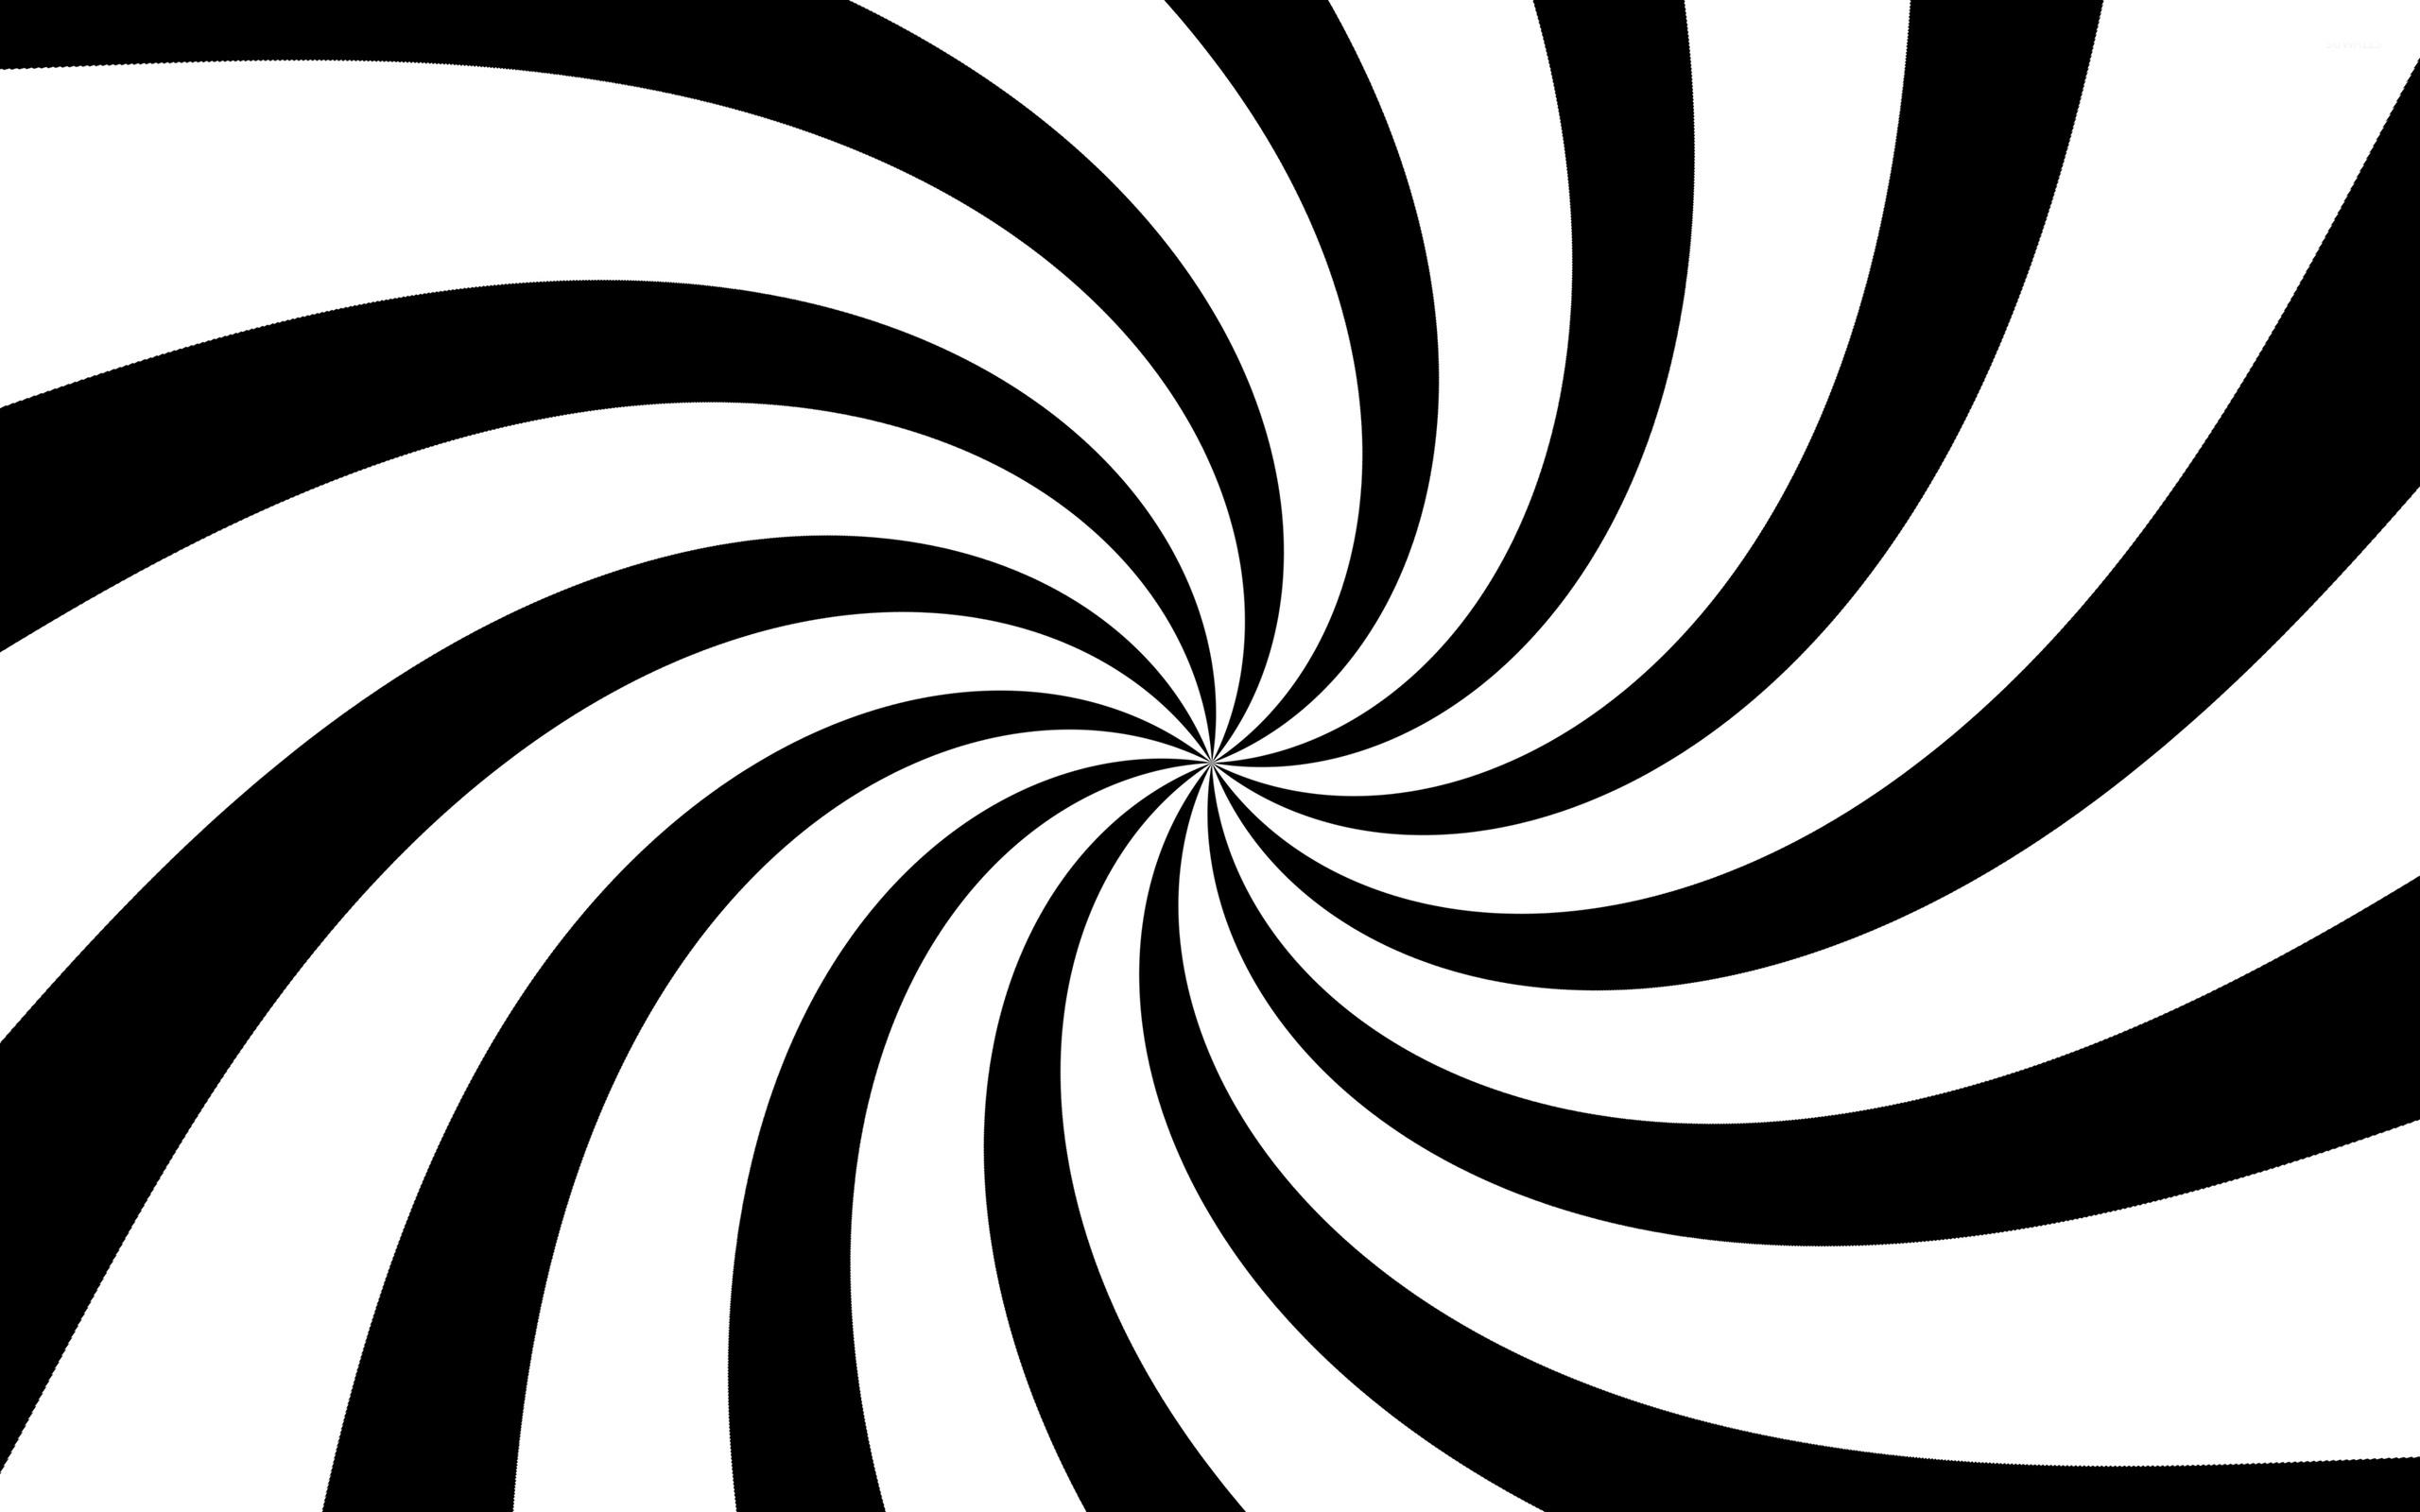 spiral wallpaper abstract wallpapers 3617 photography vector logo photography vectors png